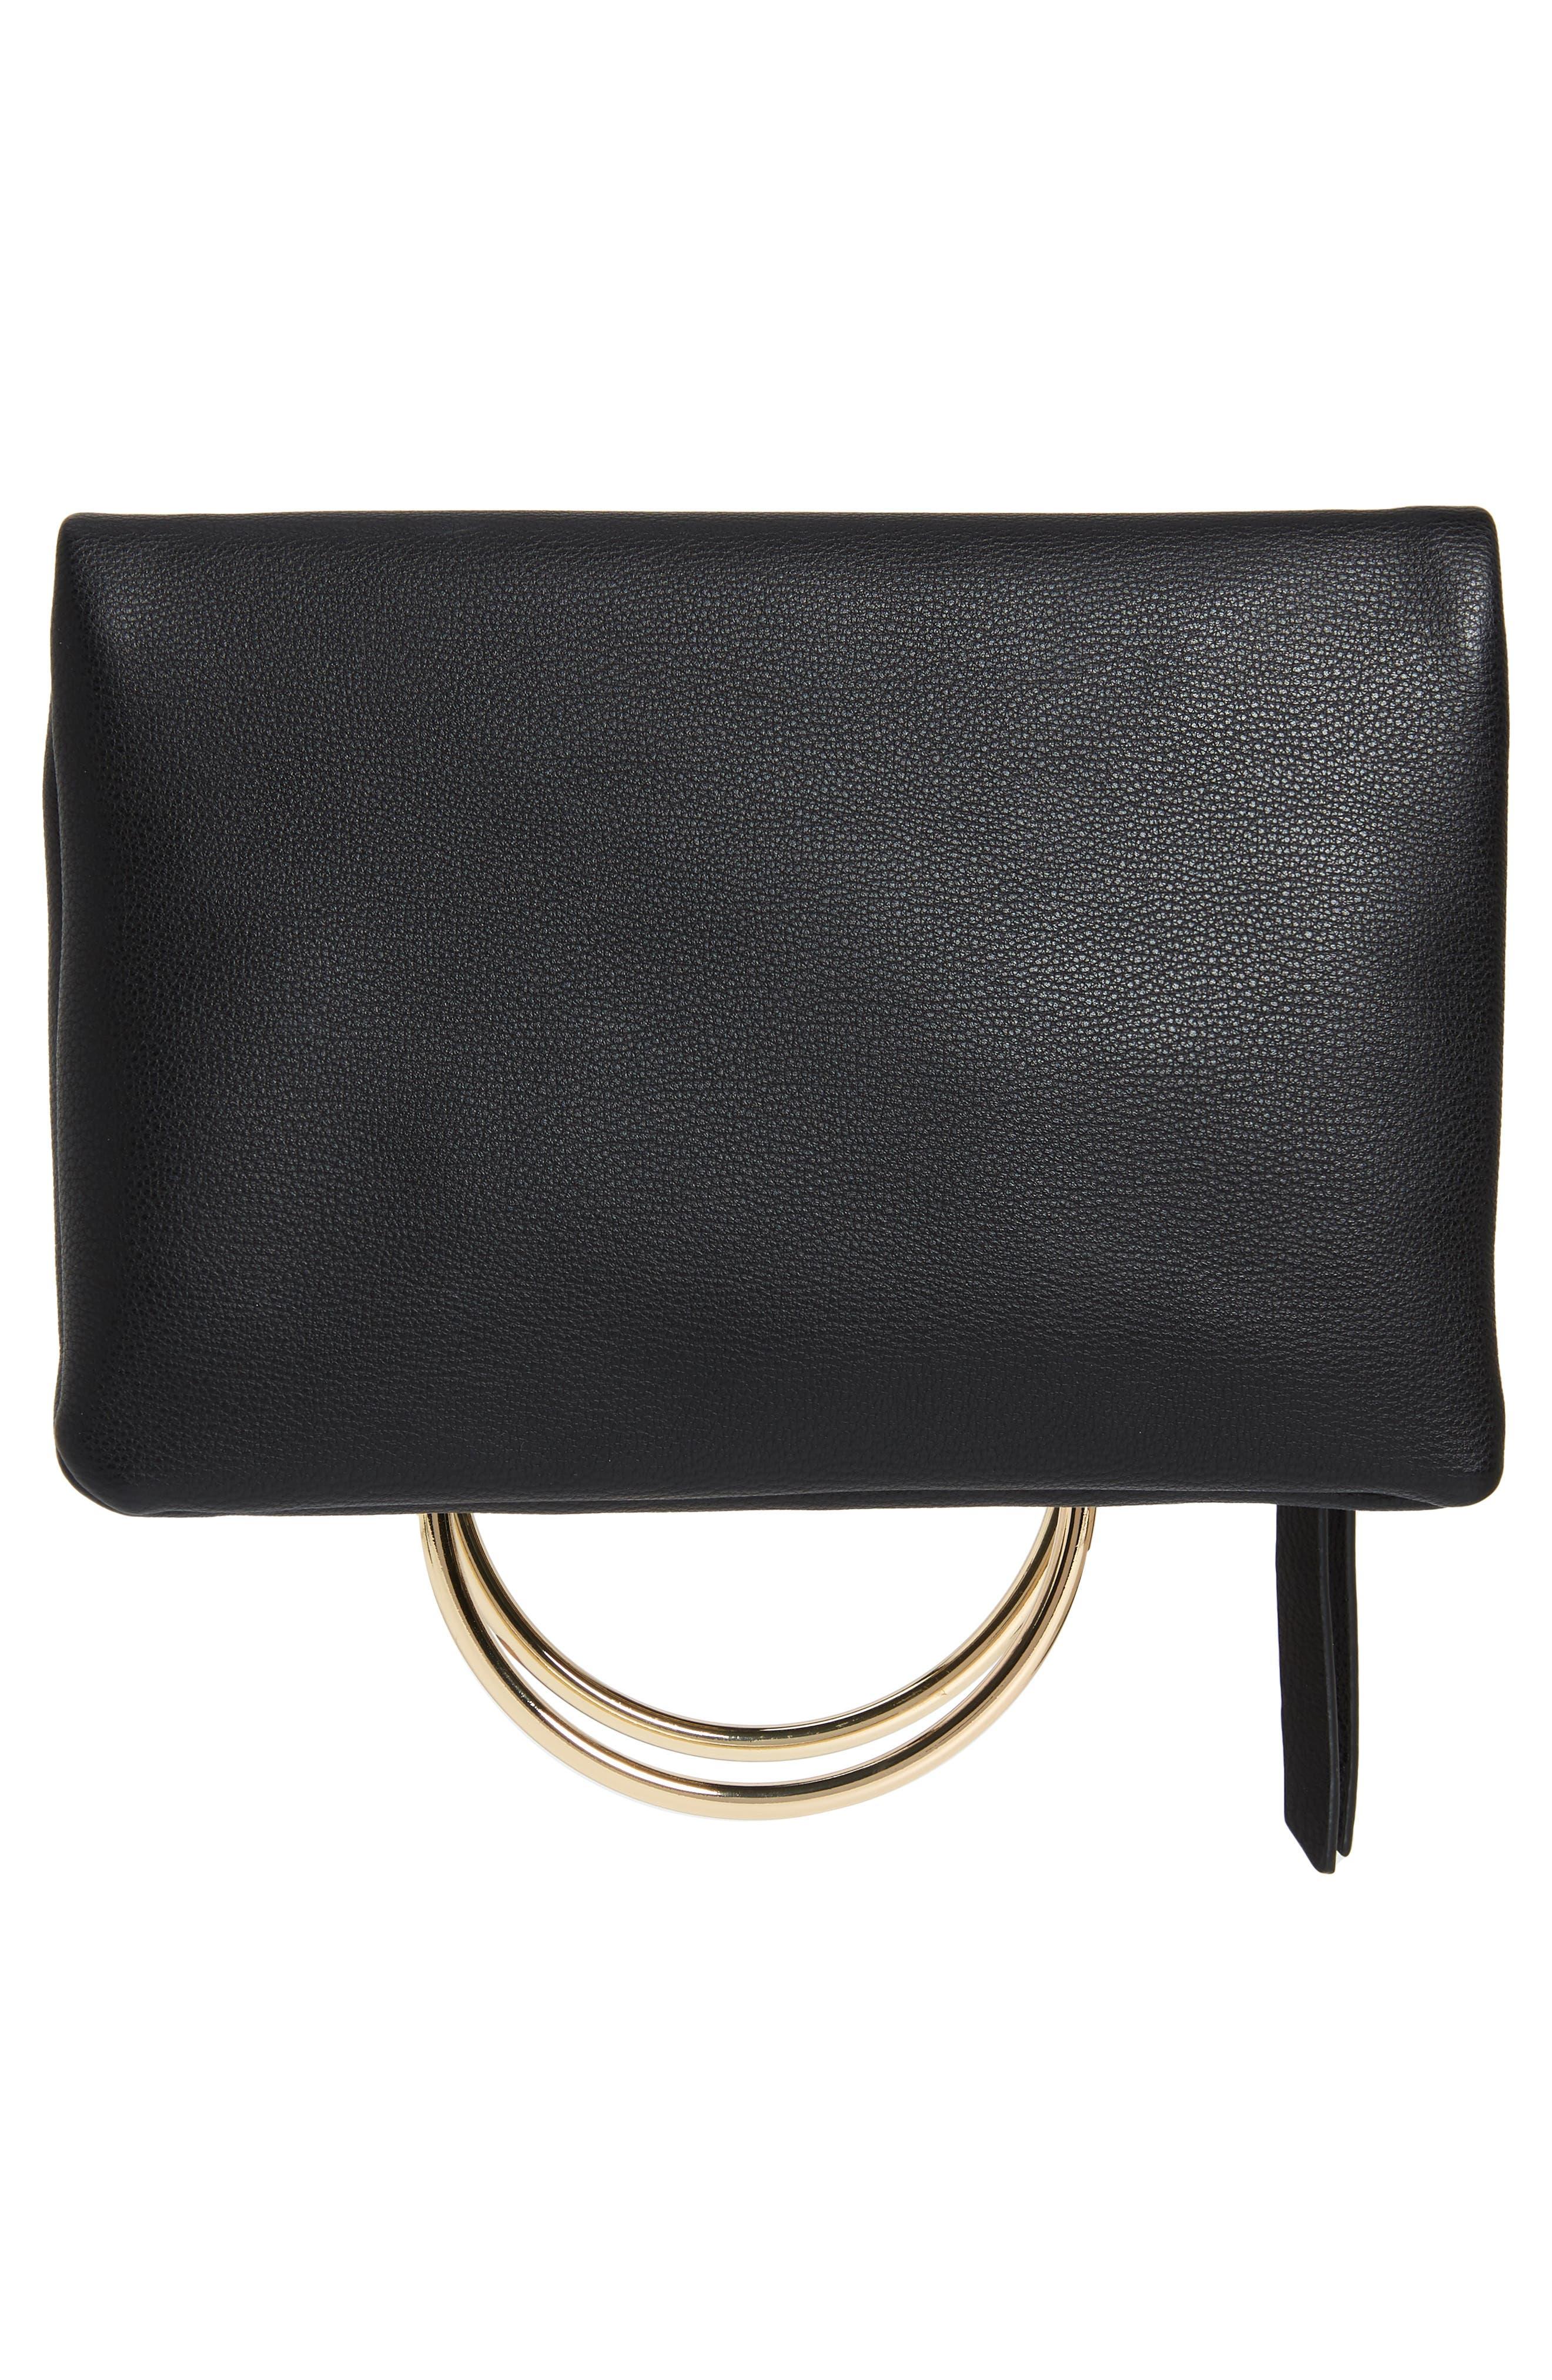 CHELSEA28, Skyler Faux Leather Foldover Clutch, Alternate thumbnail 3, color, 001